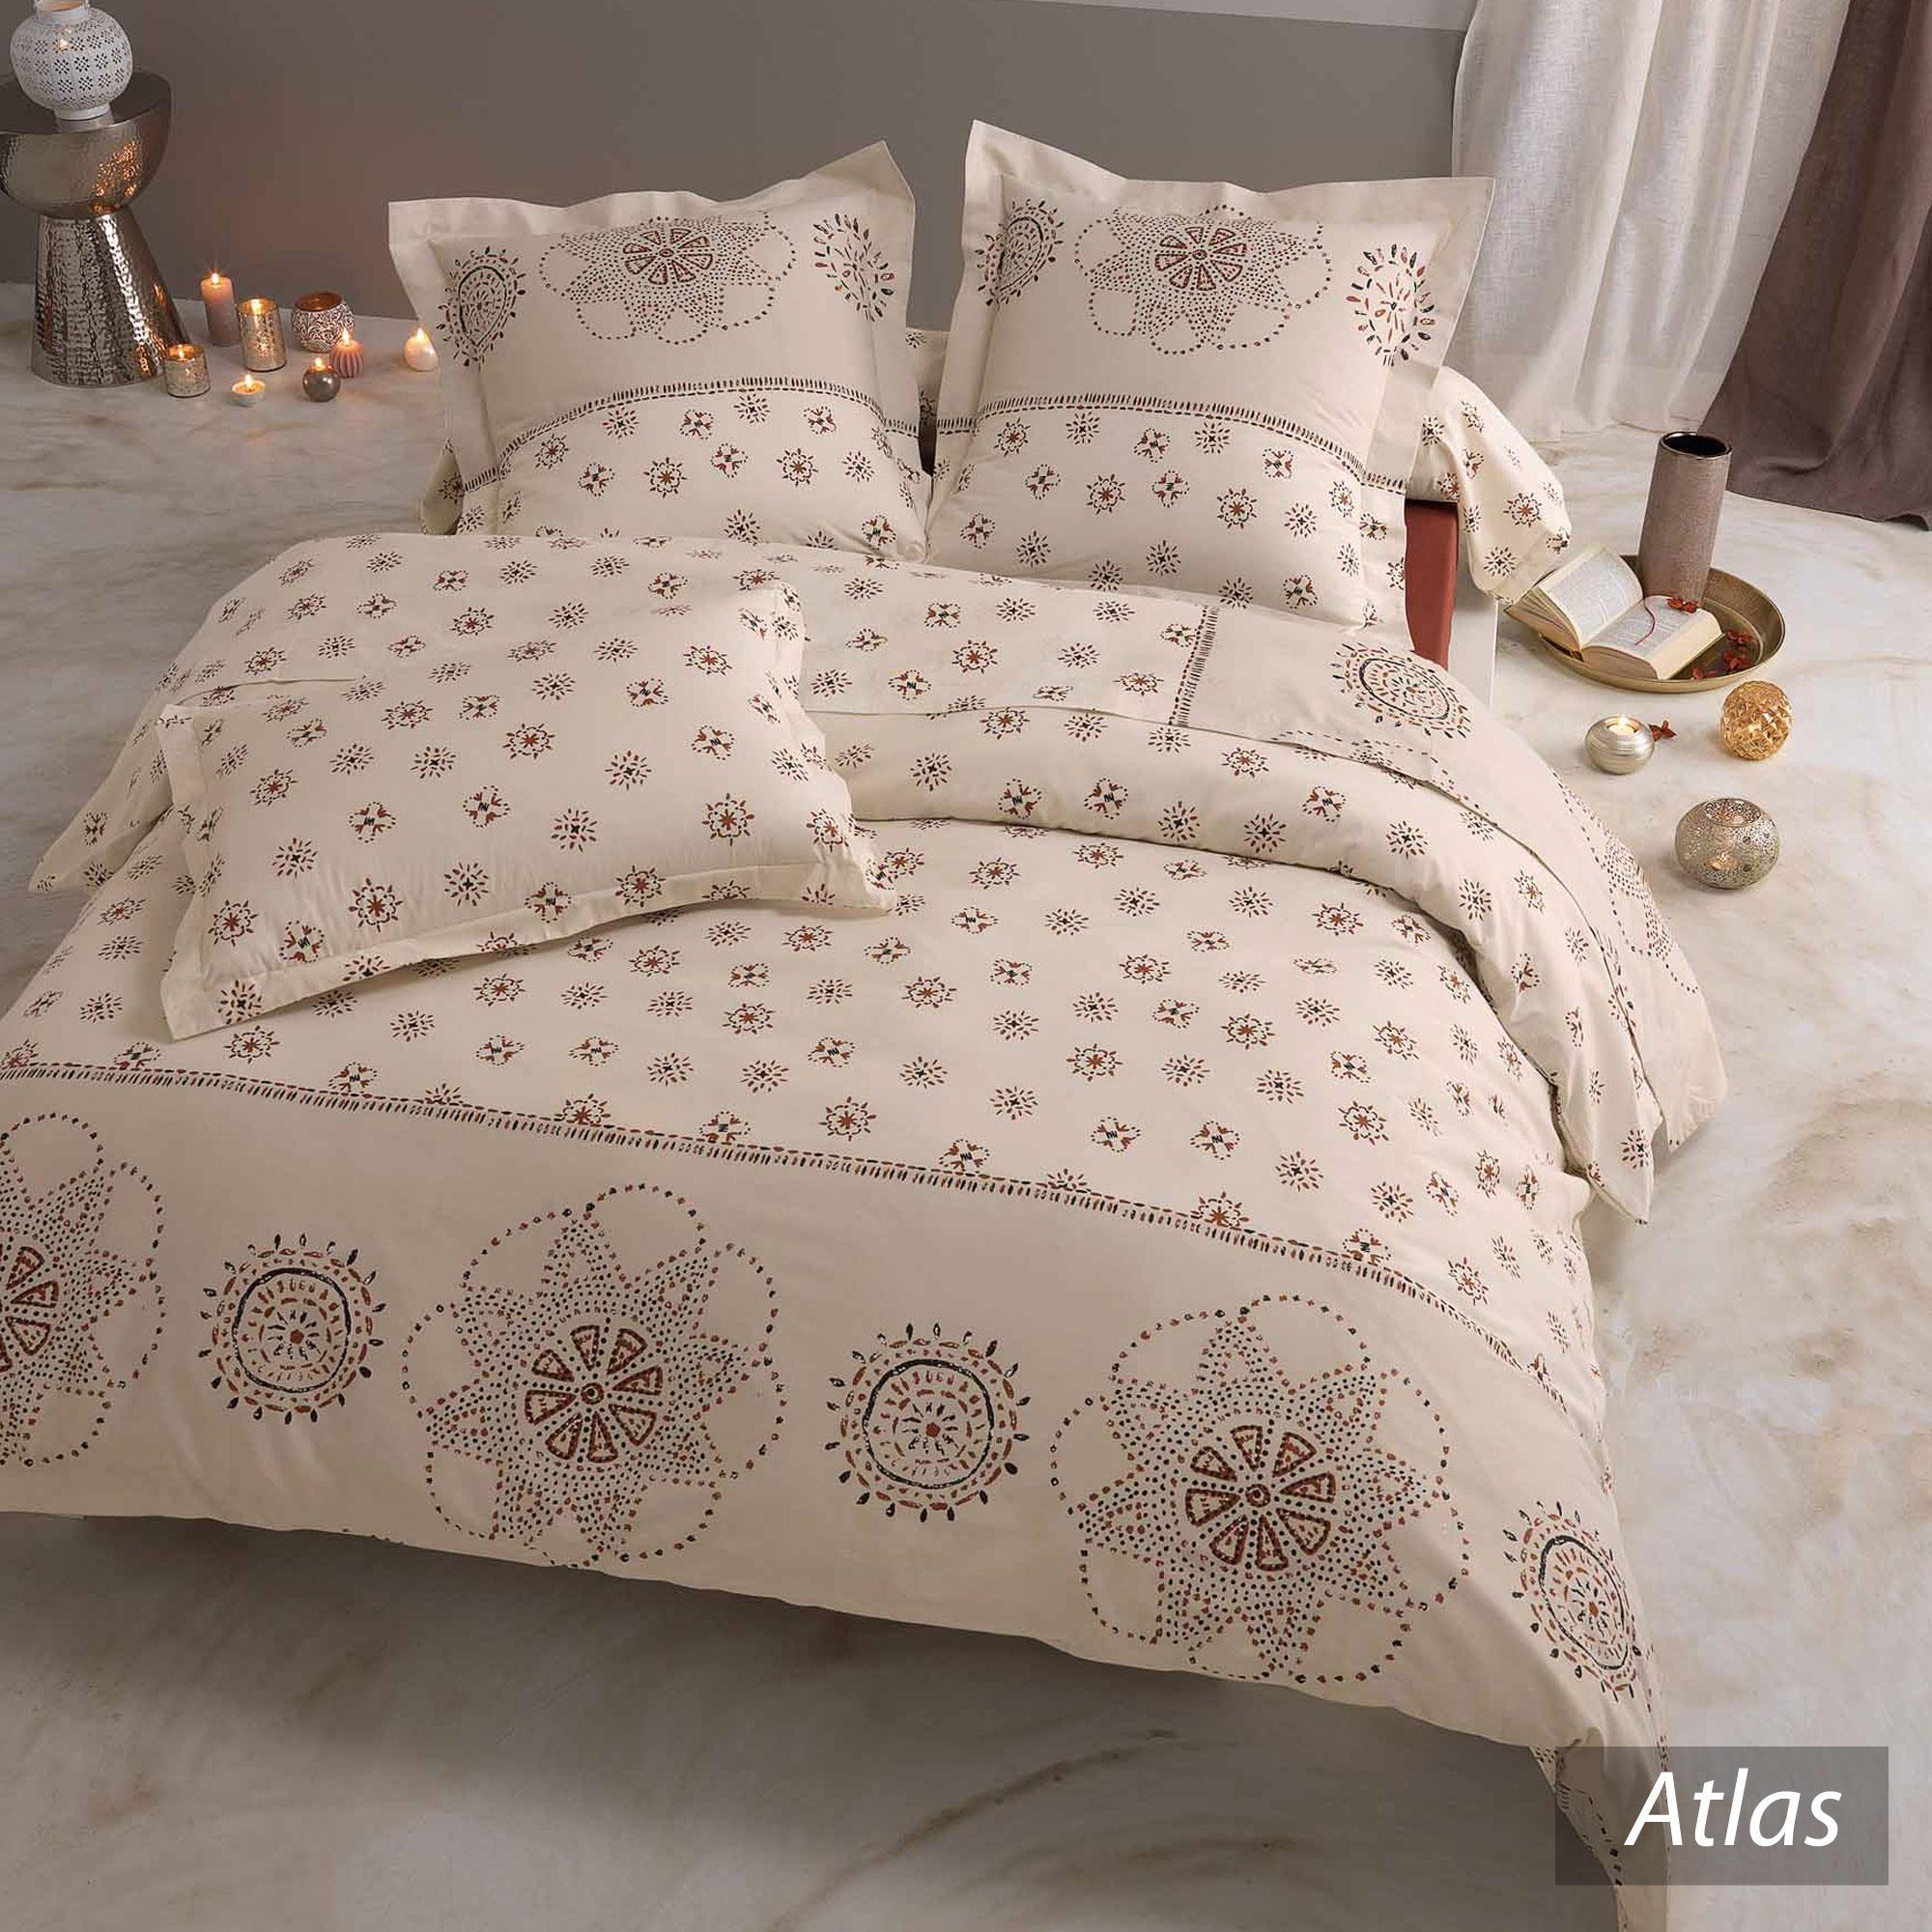 housse de couette 280x240 housse de couette 280x240 housse de couette coton 280x240 alu achat. Black Bedroom Furniture Sets. Home Design Ideas